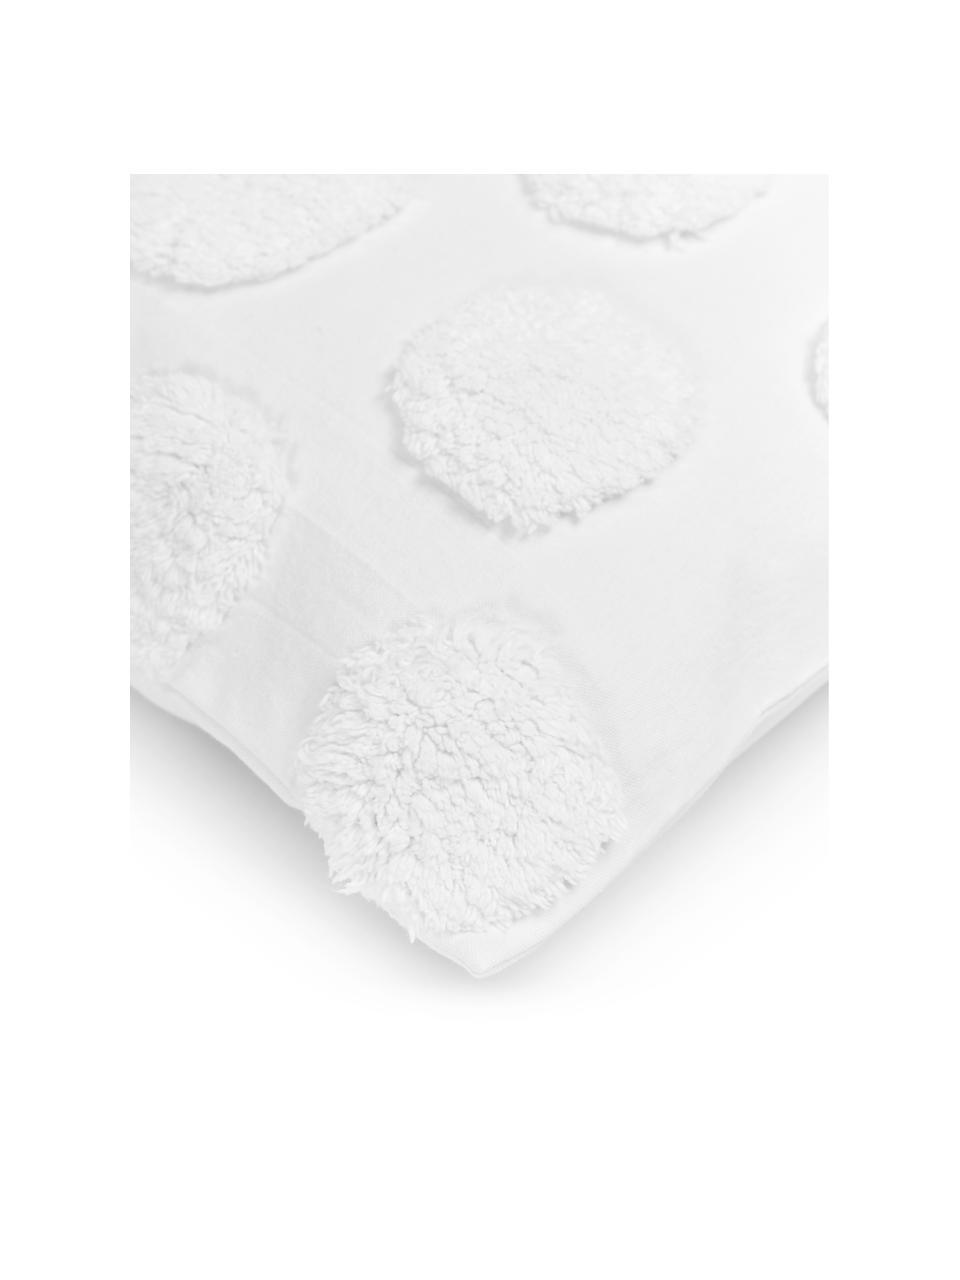 Federa arredo con motivo trapuntato Rowen, 100% cotone, Bianco, Larg. 50 x Lung. 50 cm